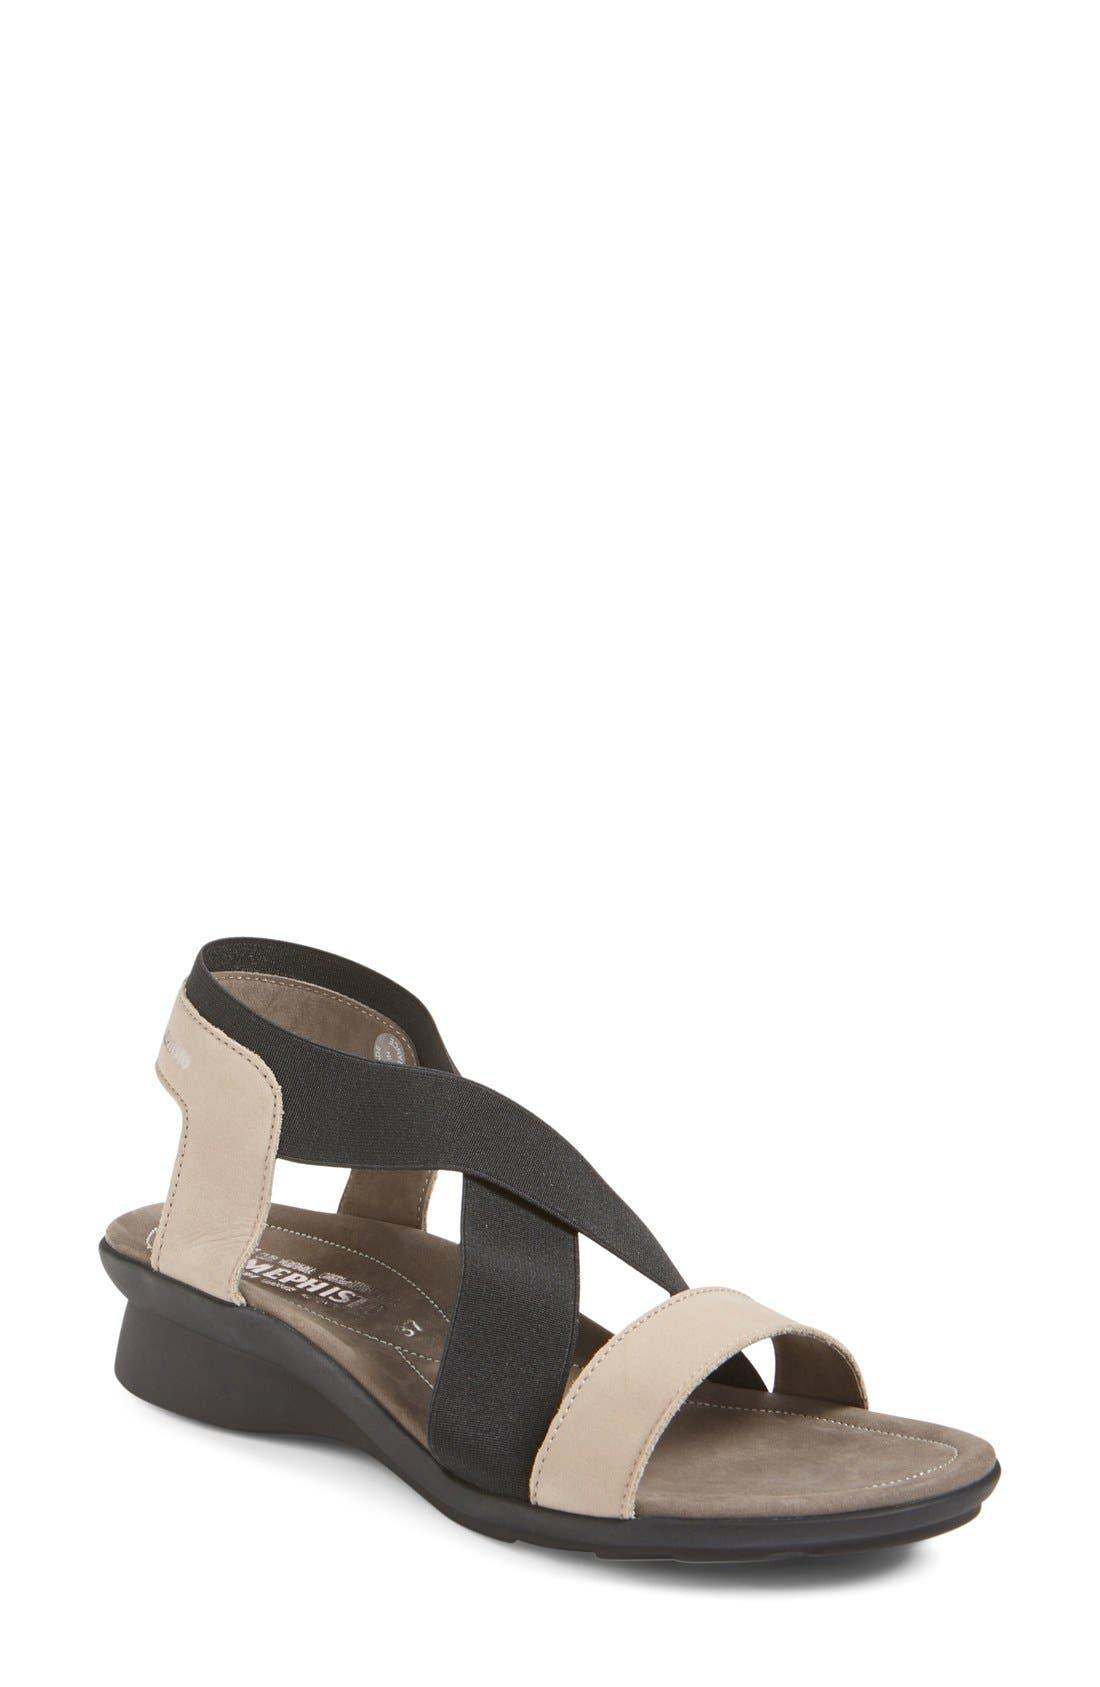 'Pastora' Sandal,                         Main,                         color, Warm Grey